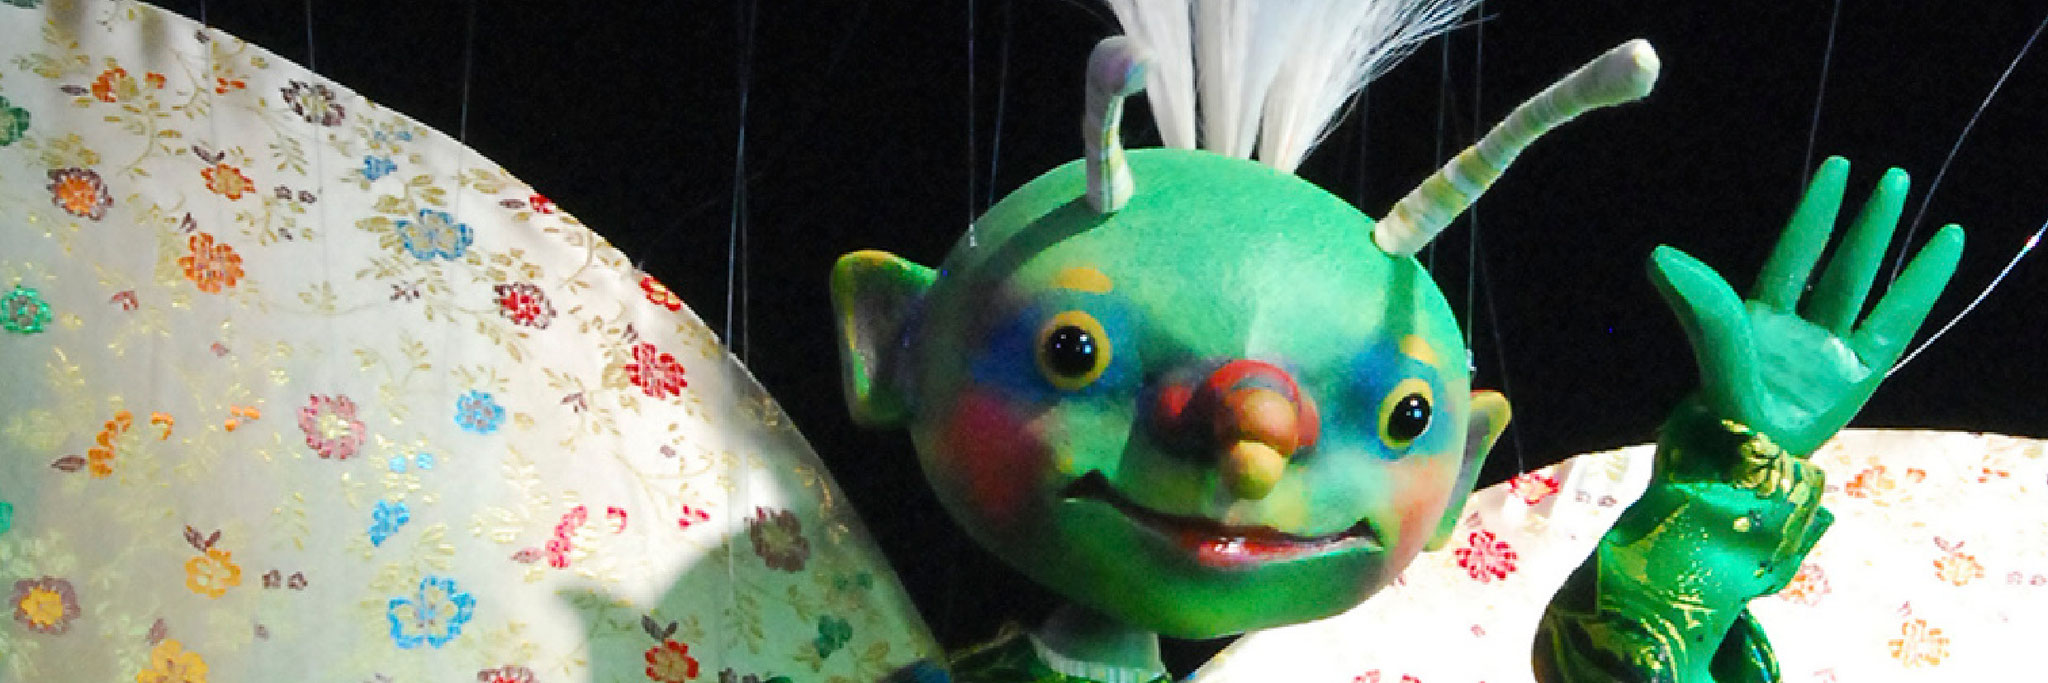 Marionettentheater Zaubervogel